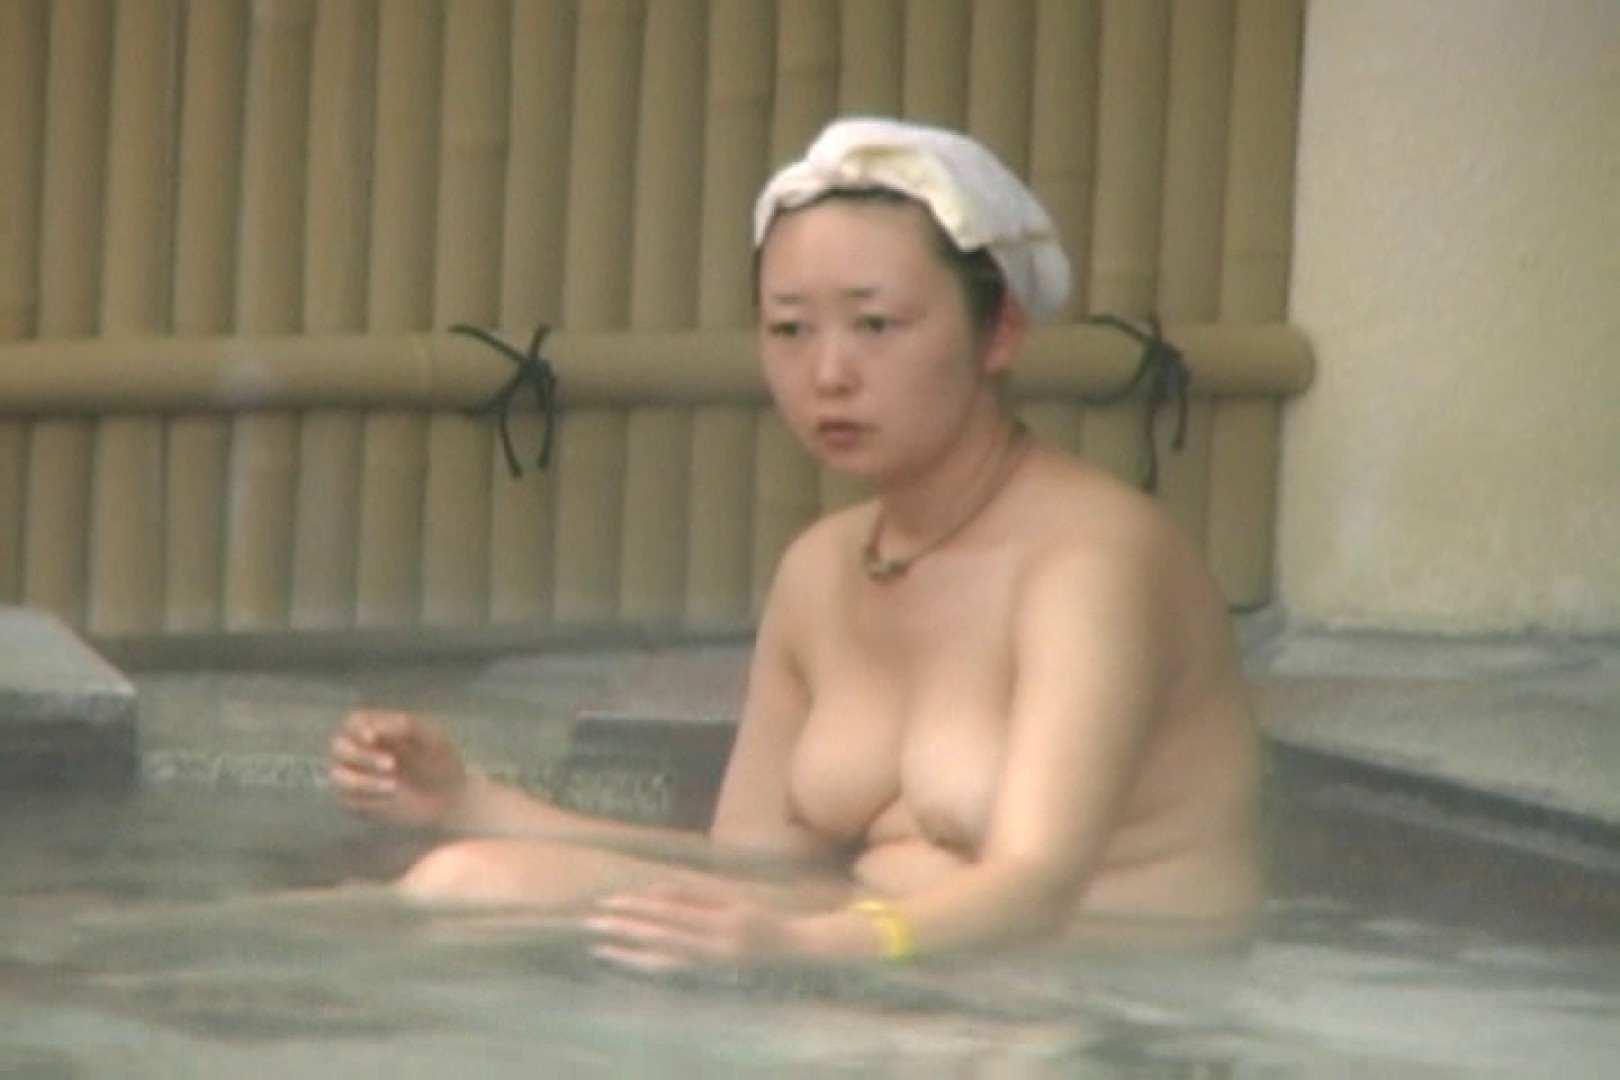 Aquaな露天風呂Vol.564 OL  87連発 66